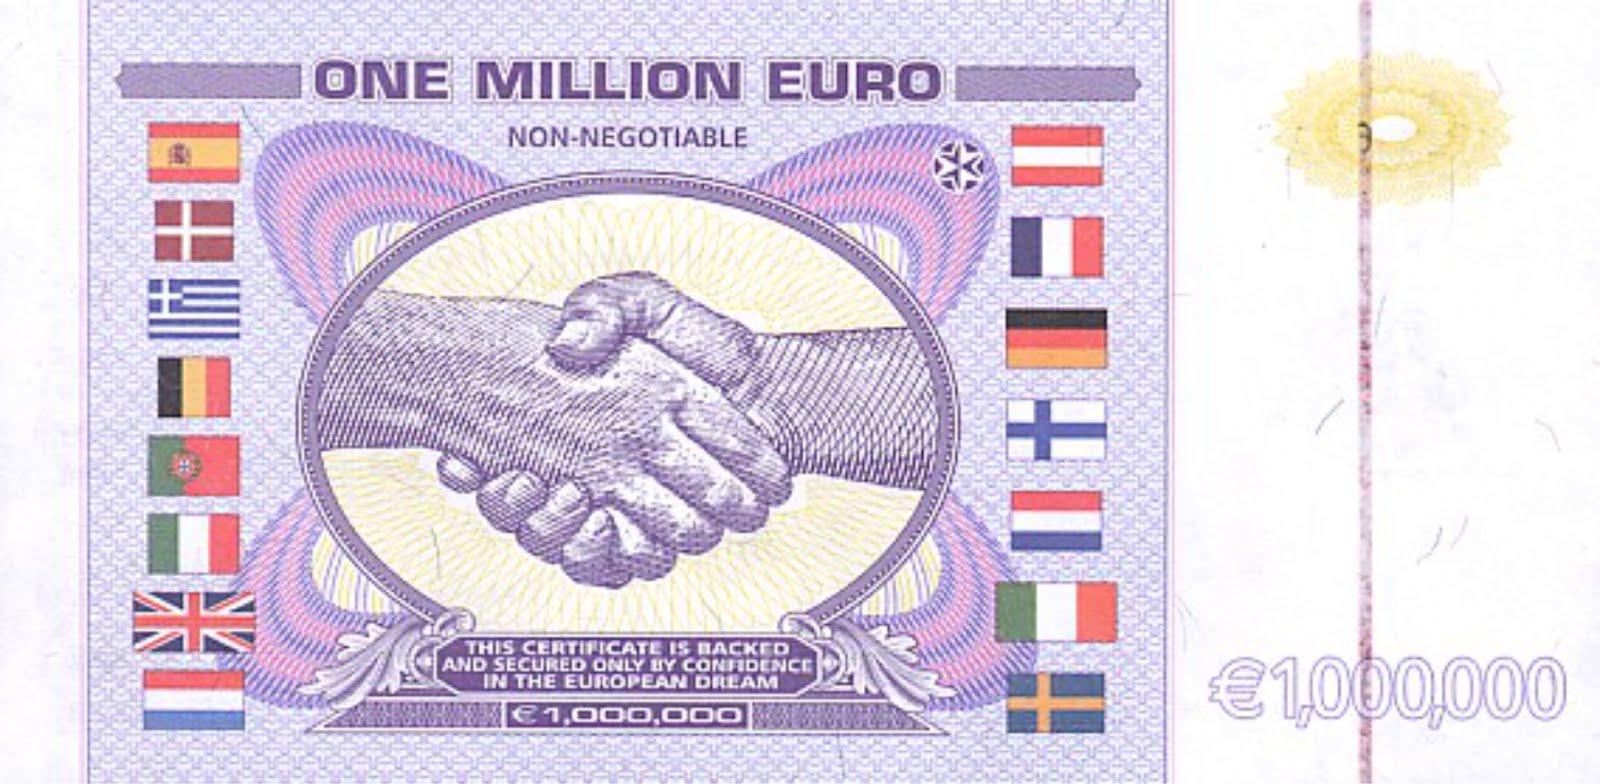 NESARA- REPUBLIC NOW - GALACTIC NEWS: One million Euro note